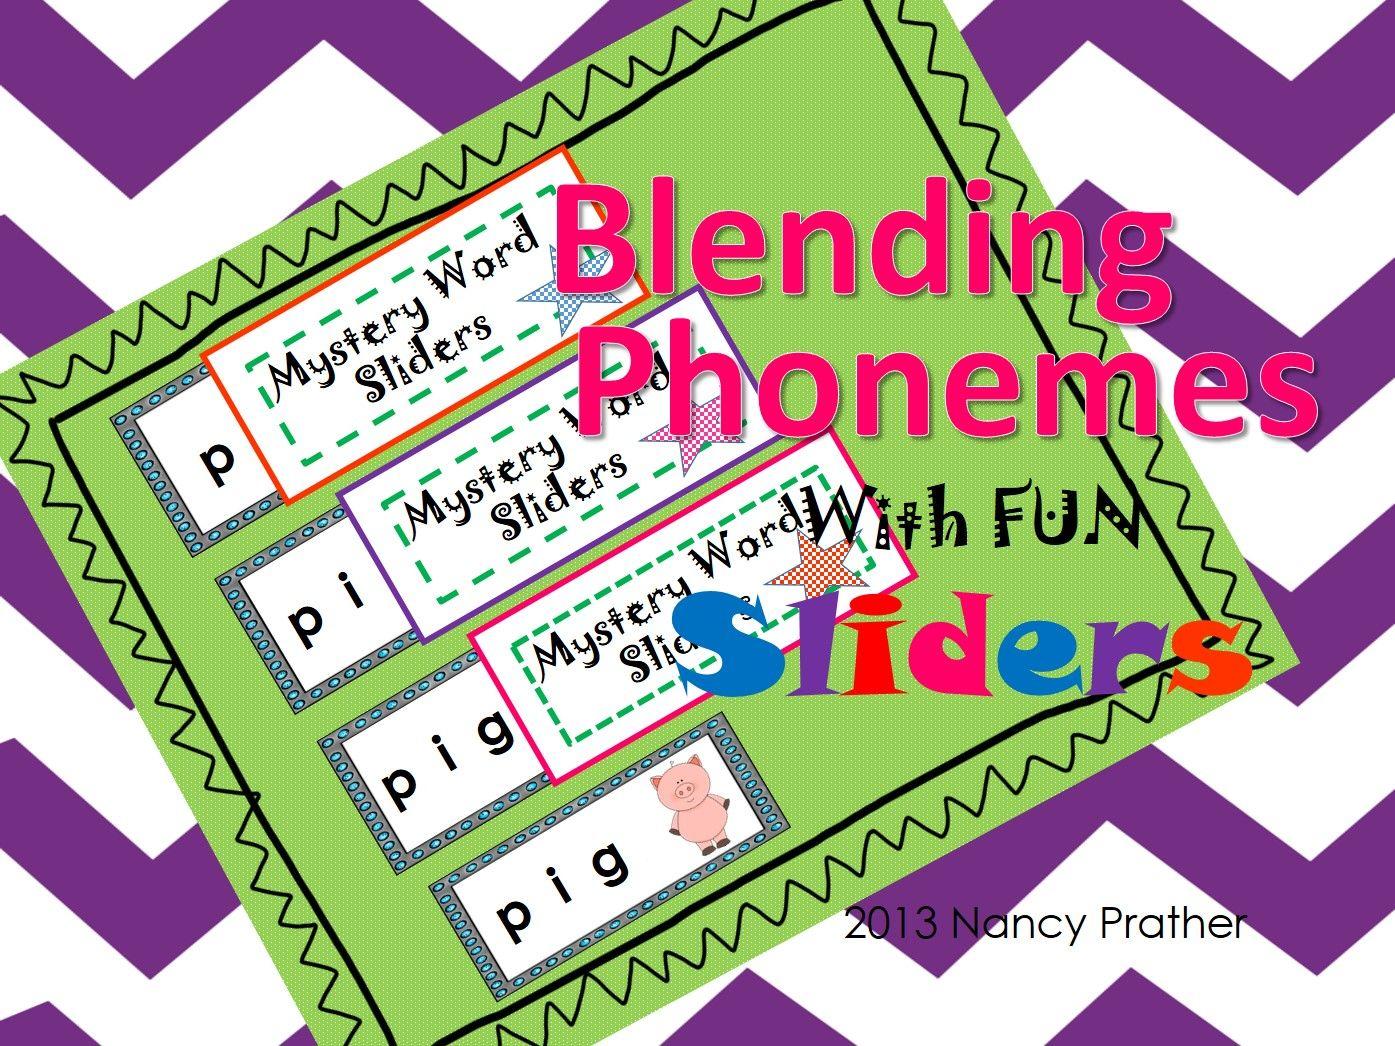 Cvc Words Blending Sounds Blending Cvc Words With Fun Sliders